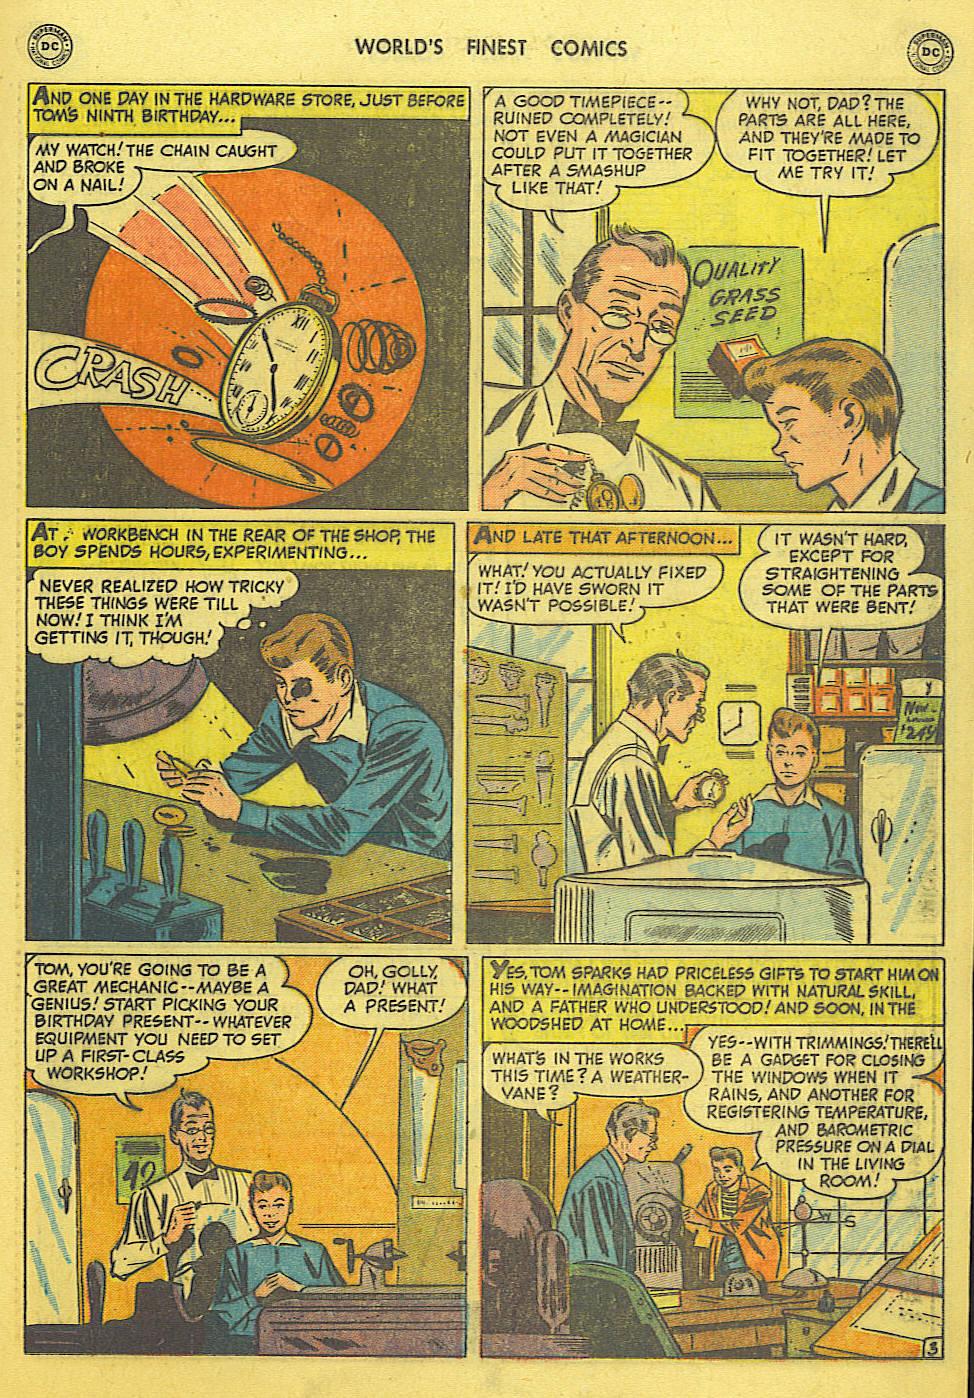 Read online World's Finest Comics comic -  Issue #49 - 32